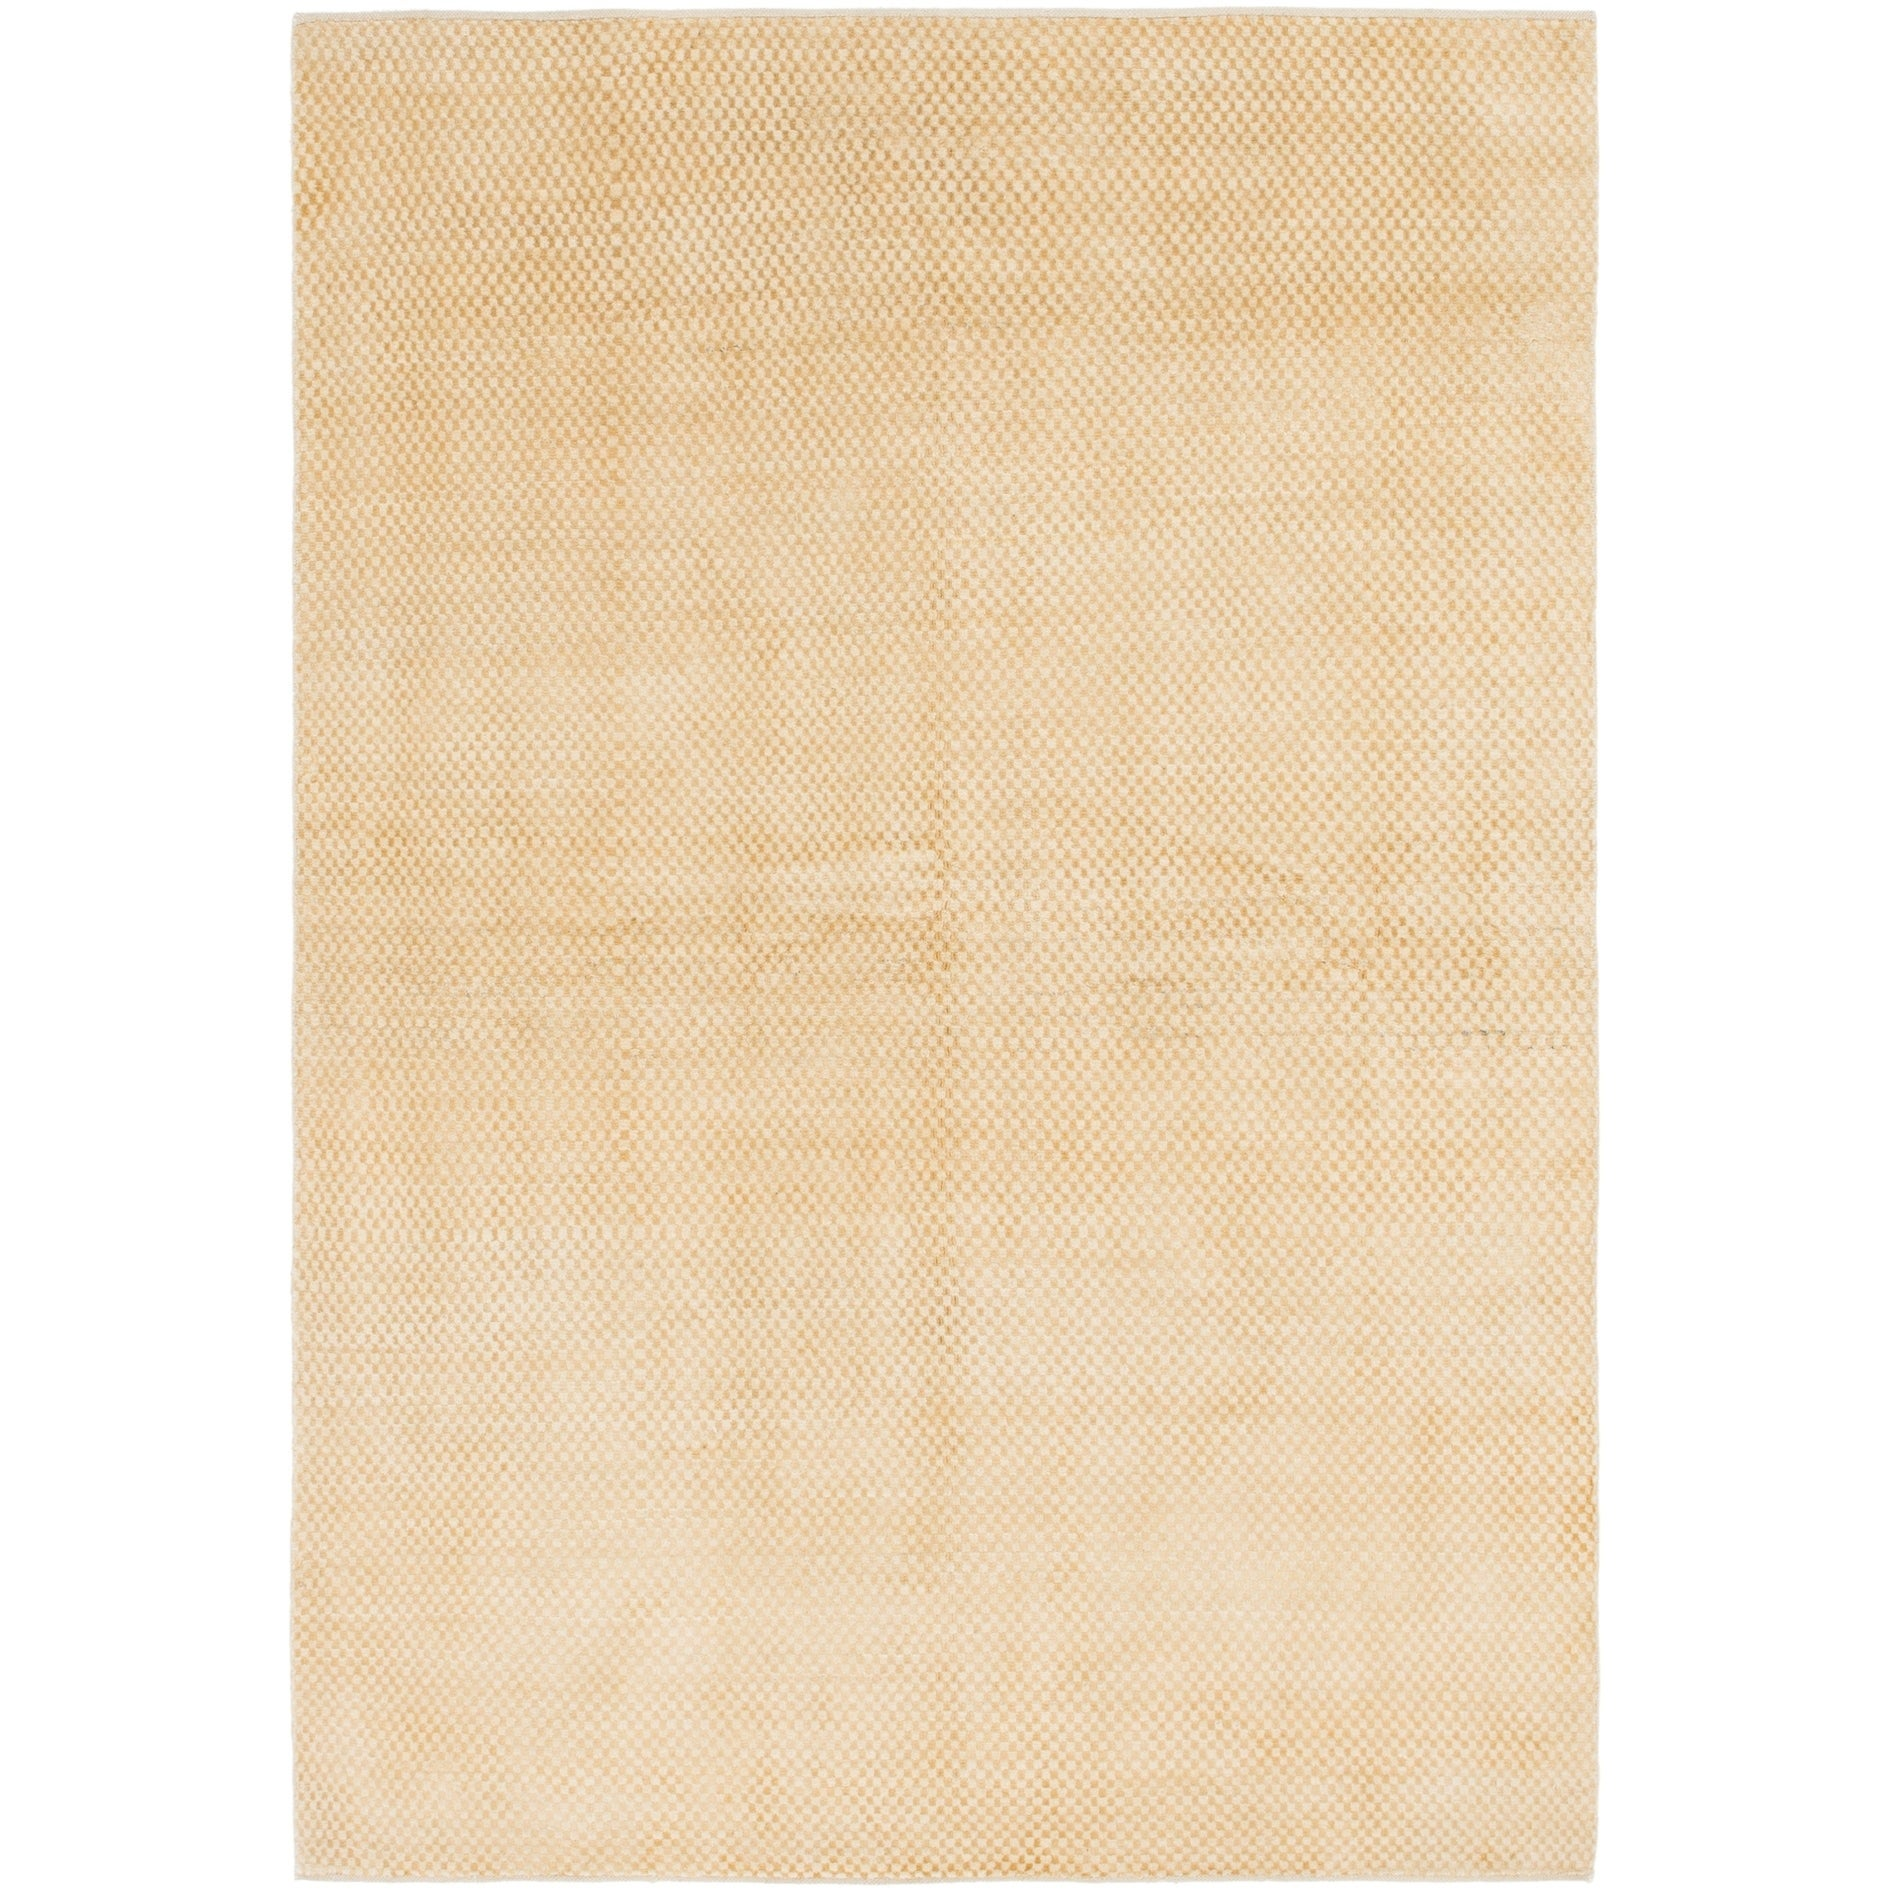 Hand Knotted Kashkuli Gabbeh Wool Area Rug - 5 4 x 7 10 (Gold - 5 4 x 7 10)